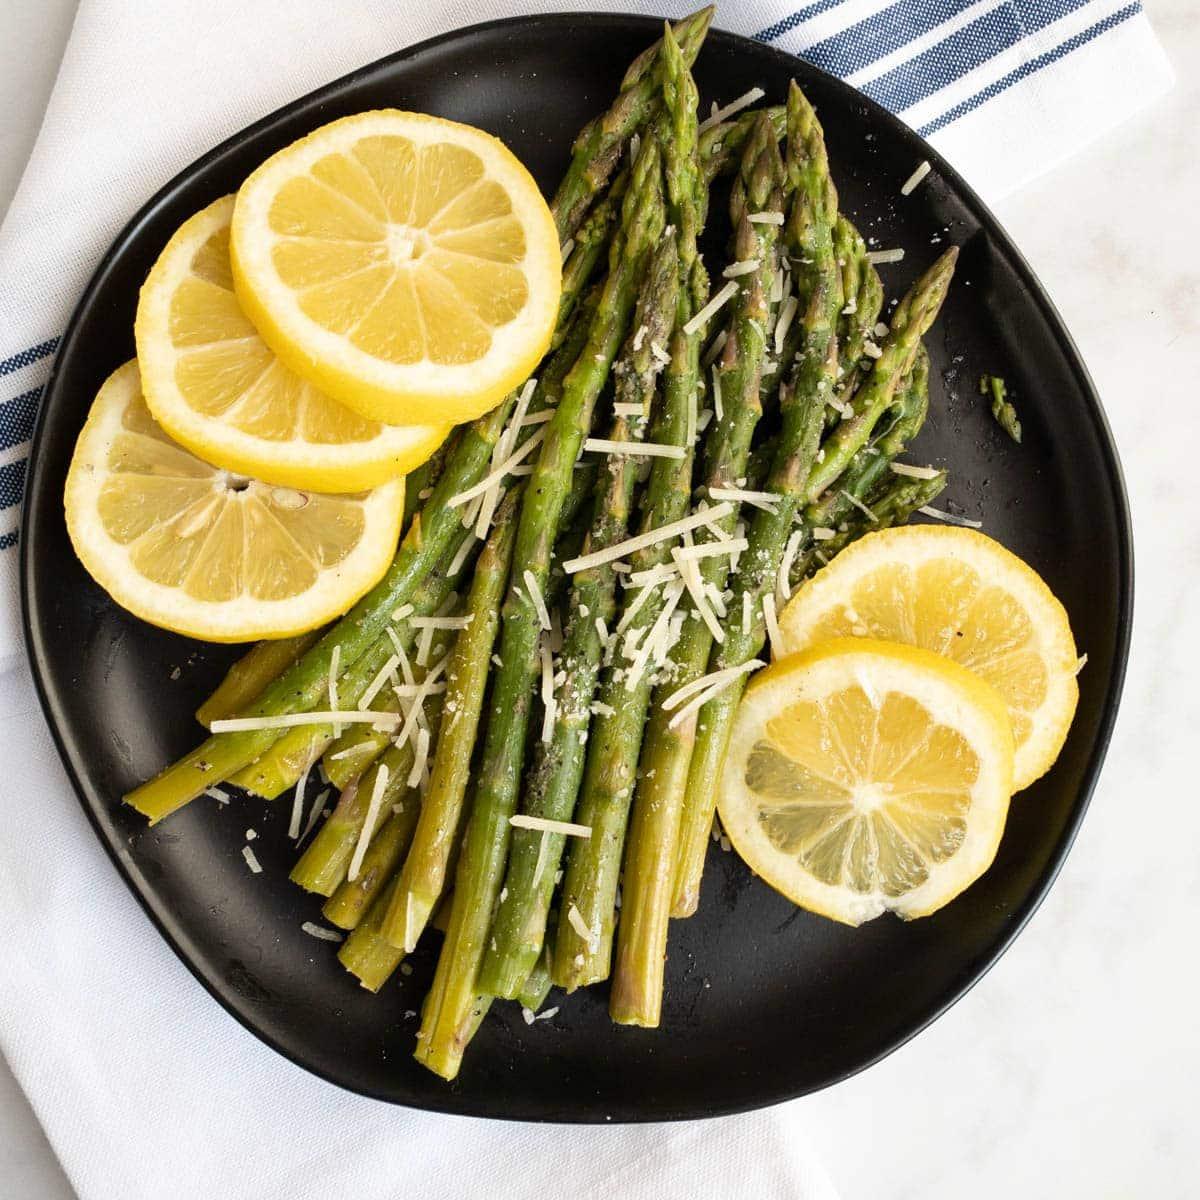 Instant Pot Asparagus on a plate with lemon